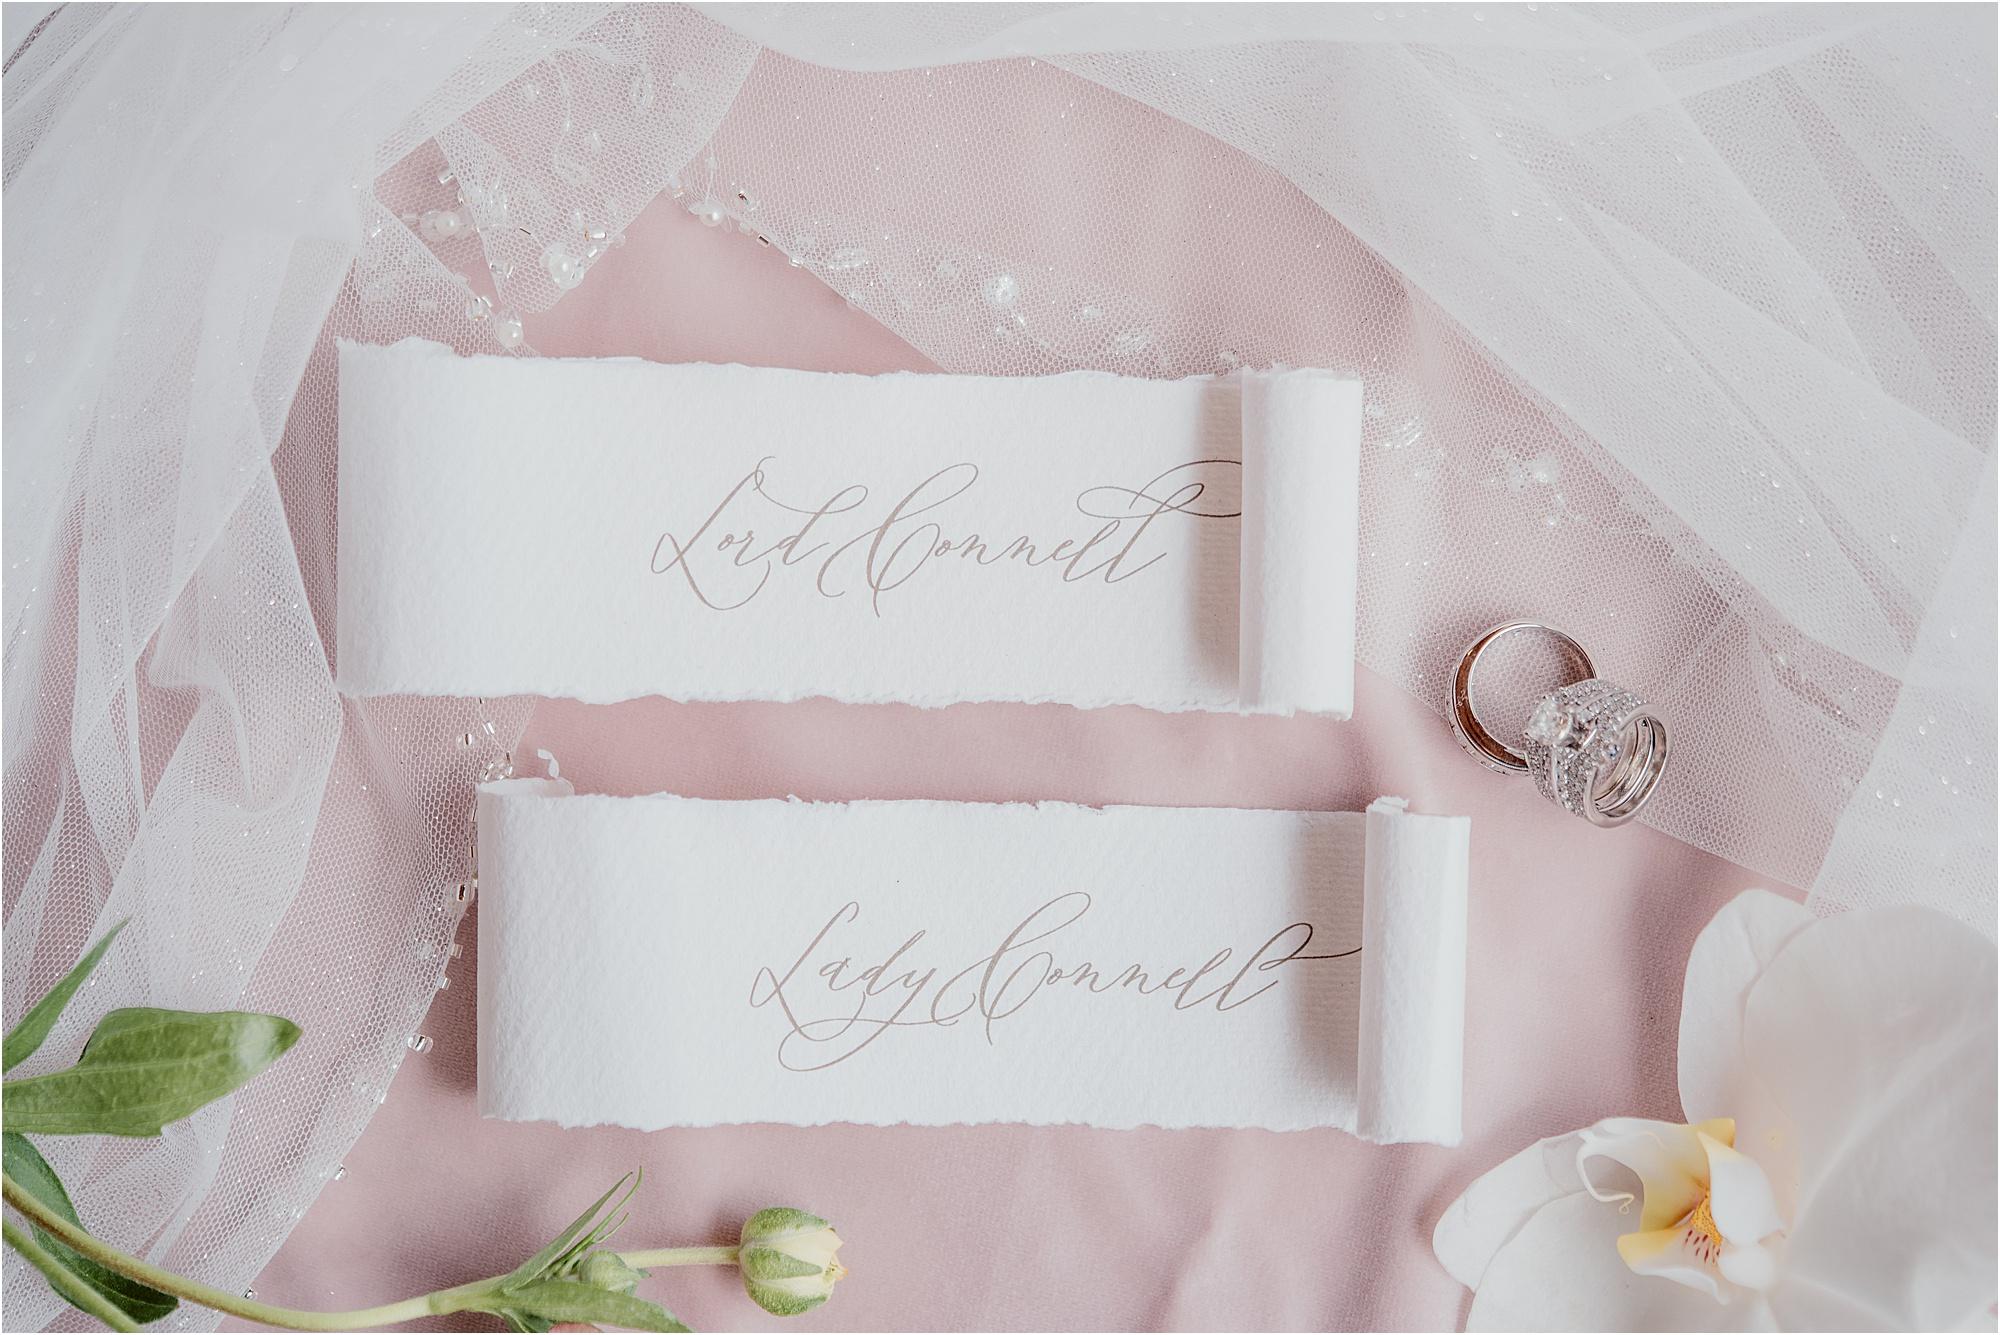 Fairytale wedding with luxury calligraphy and handlettering